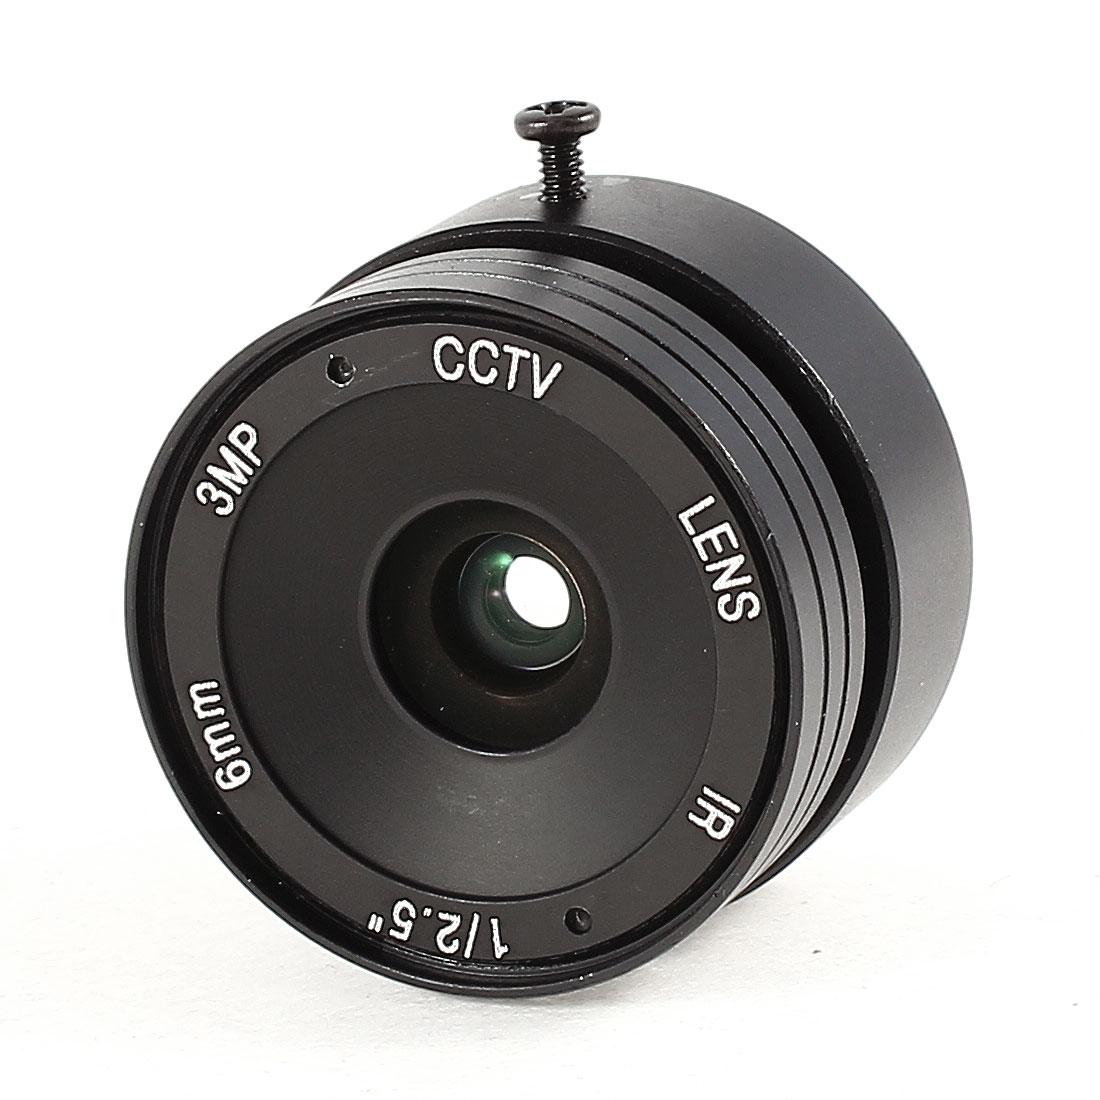 "CCTV Box Camera Fixed 6mm Focus Length F1.4 IR Board Lens 1/2.5"""